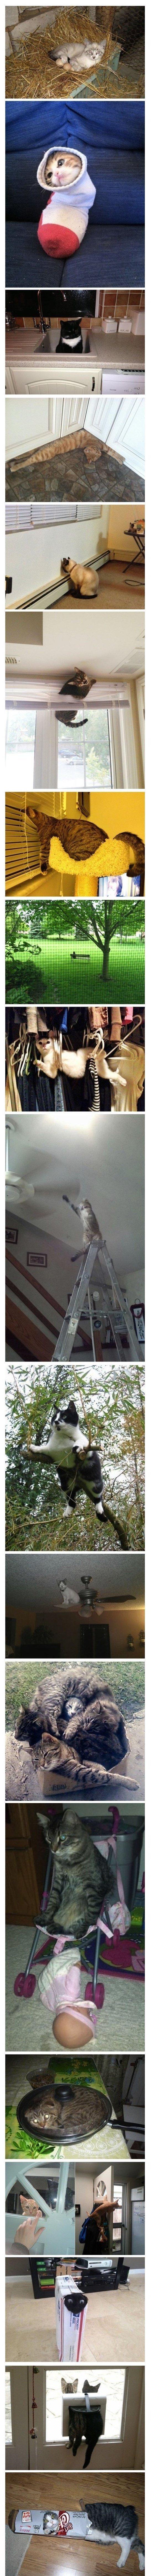 Socialy Awkward Cat